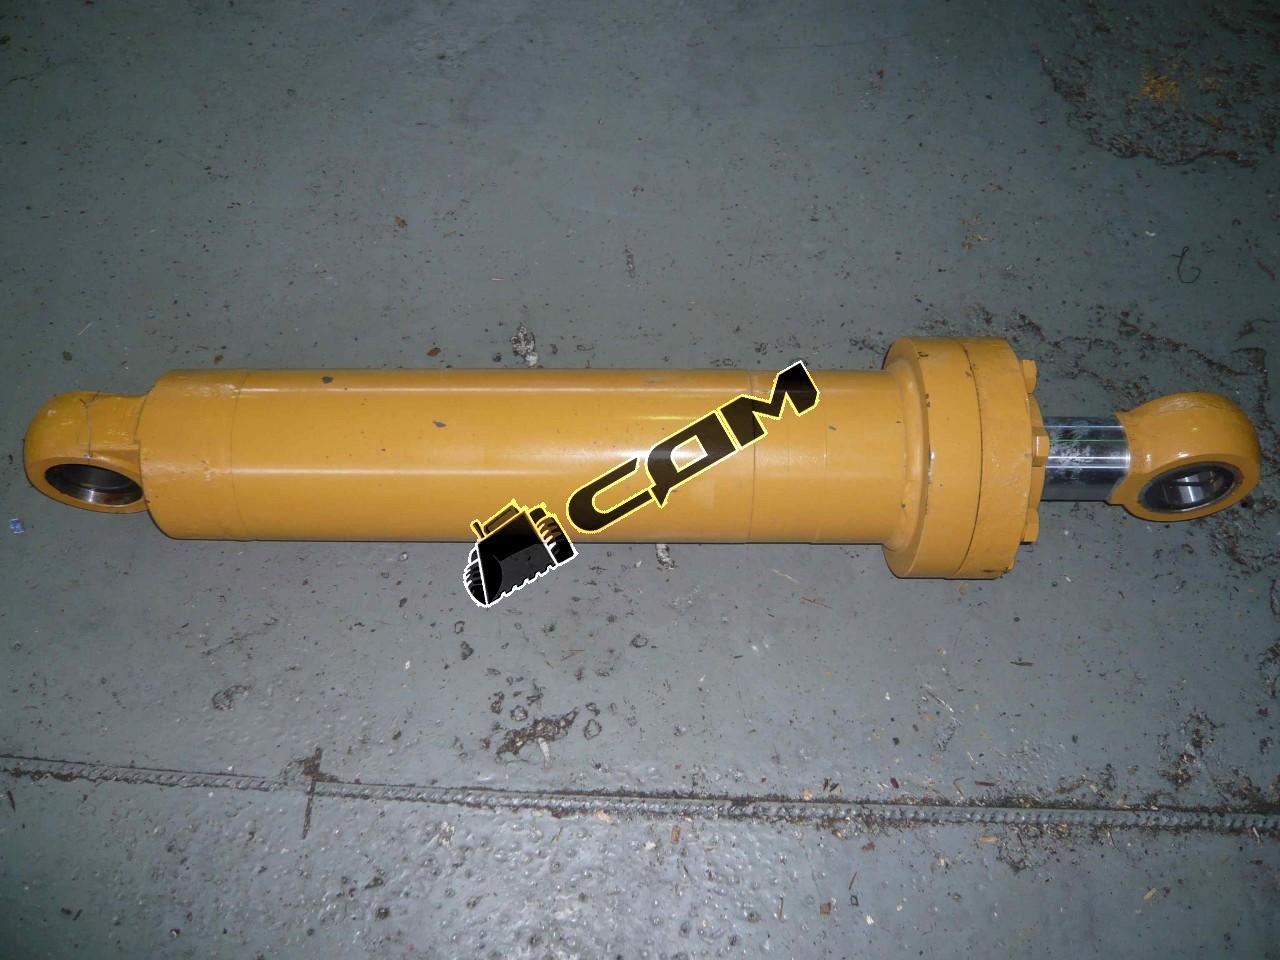 Цилиндр управления ковшом CDM833-71 607PG830H-05003  LG30F.07.01A